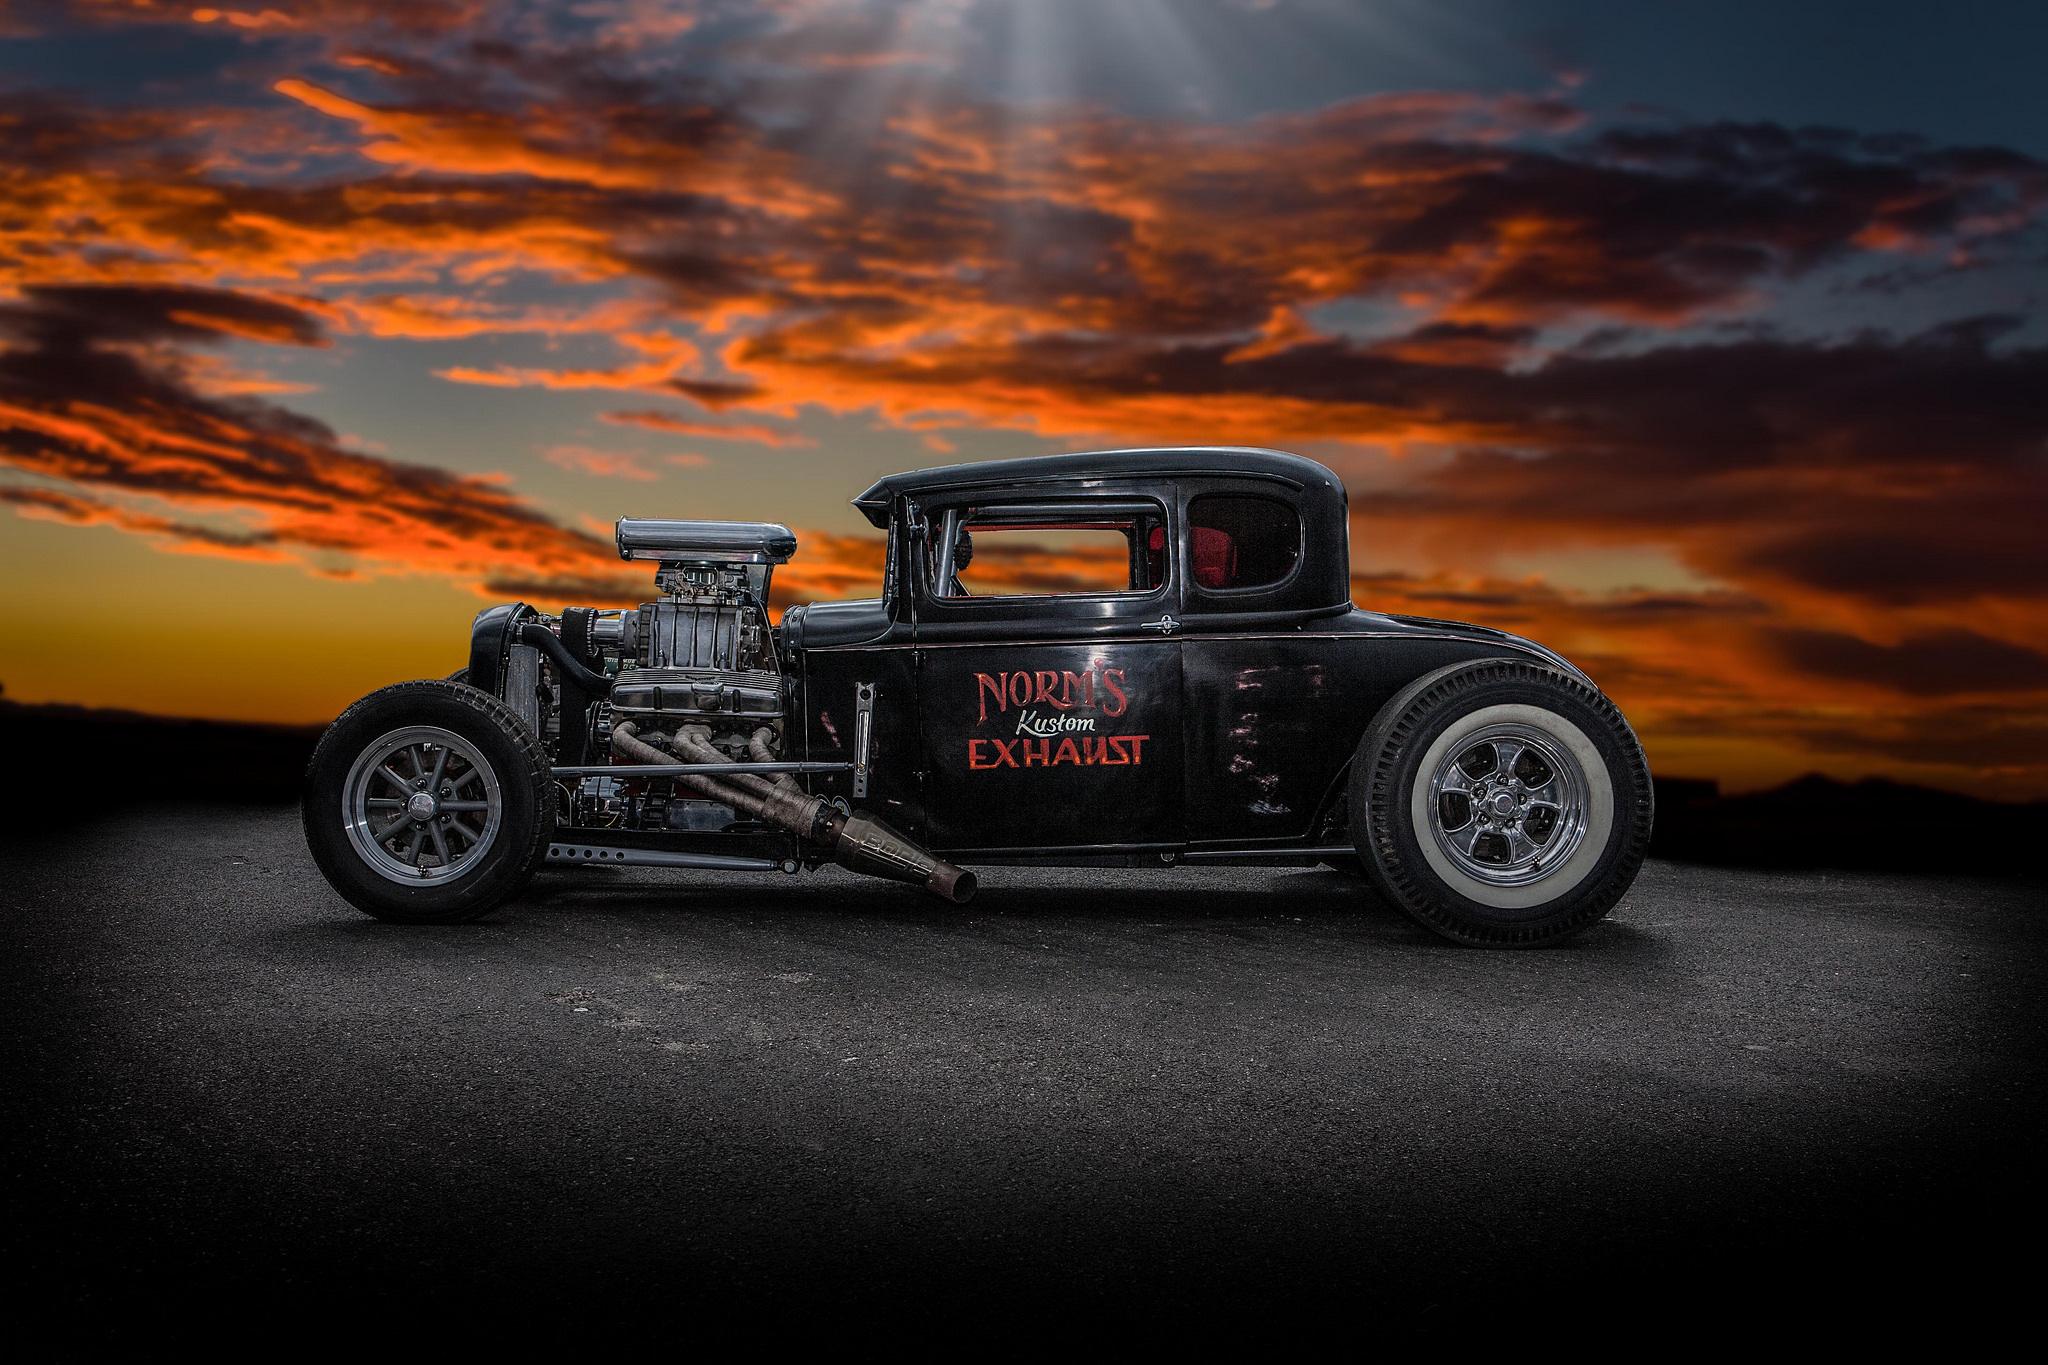 Hot rod classic car classic retro background wallpaper photos 2048x1365